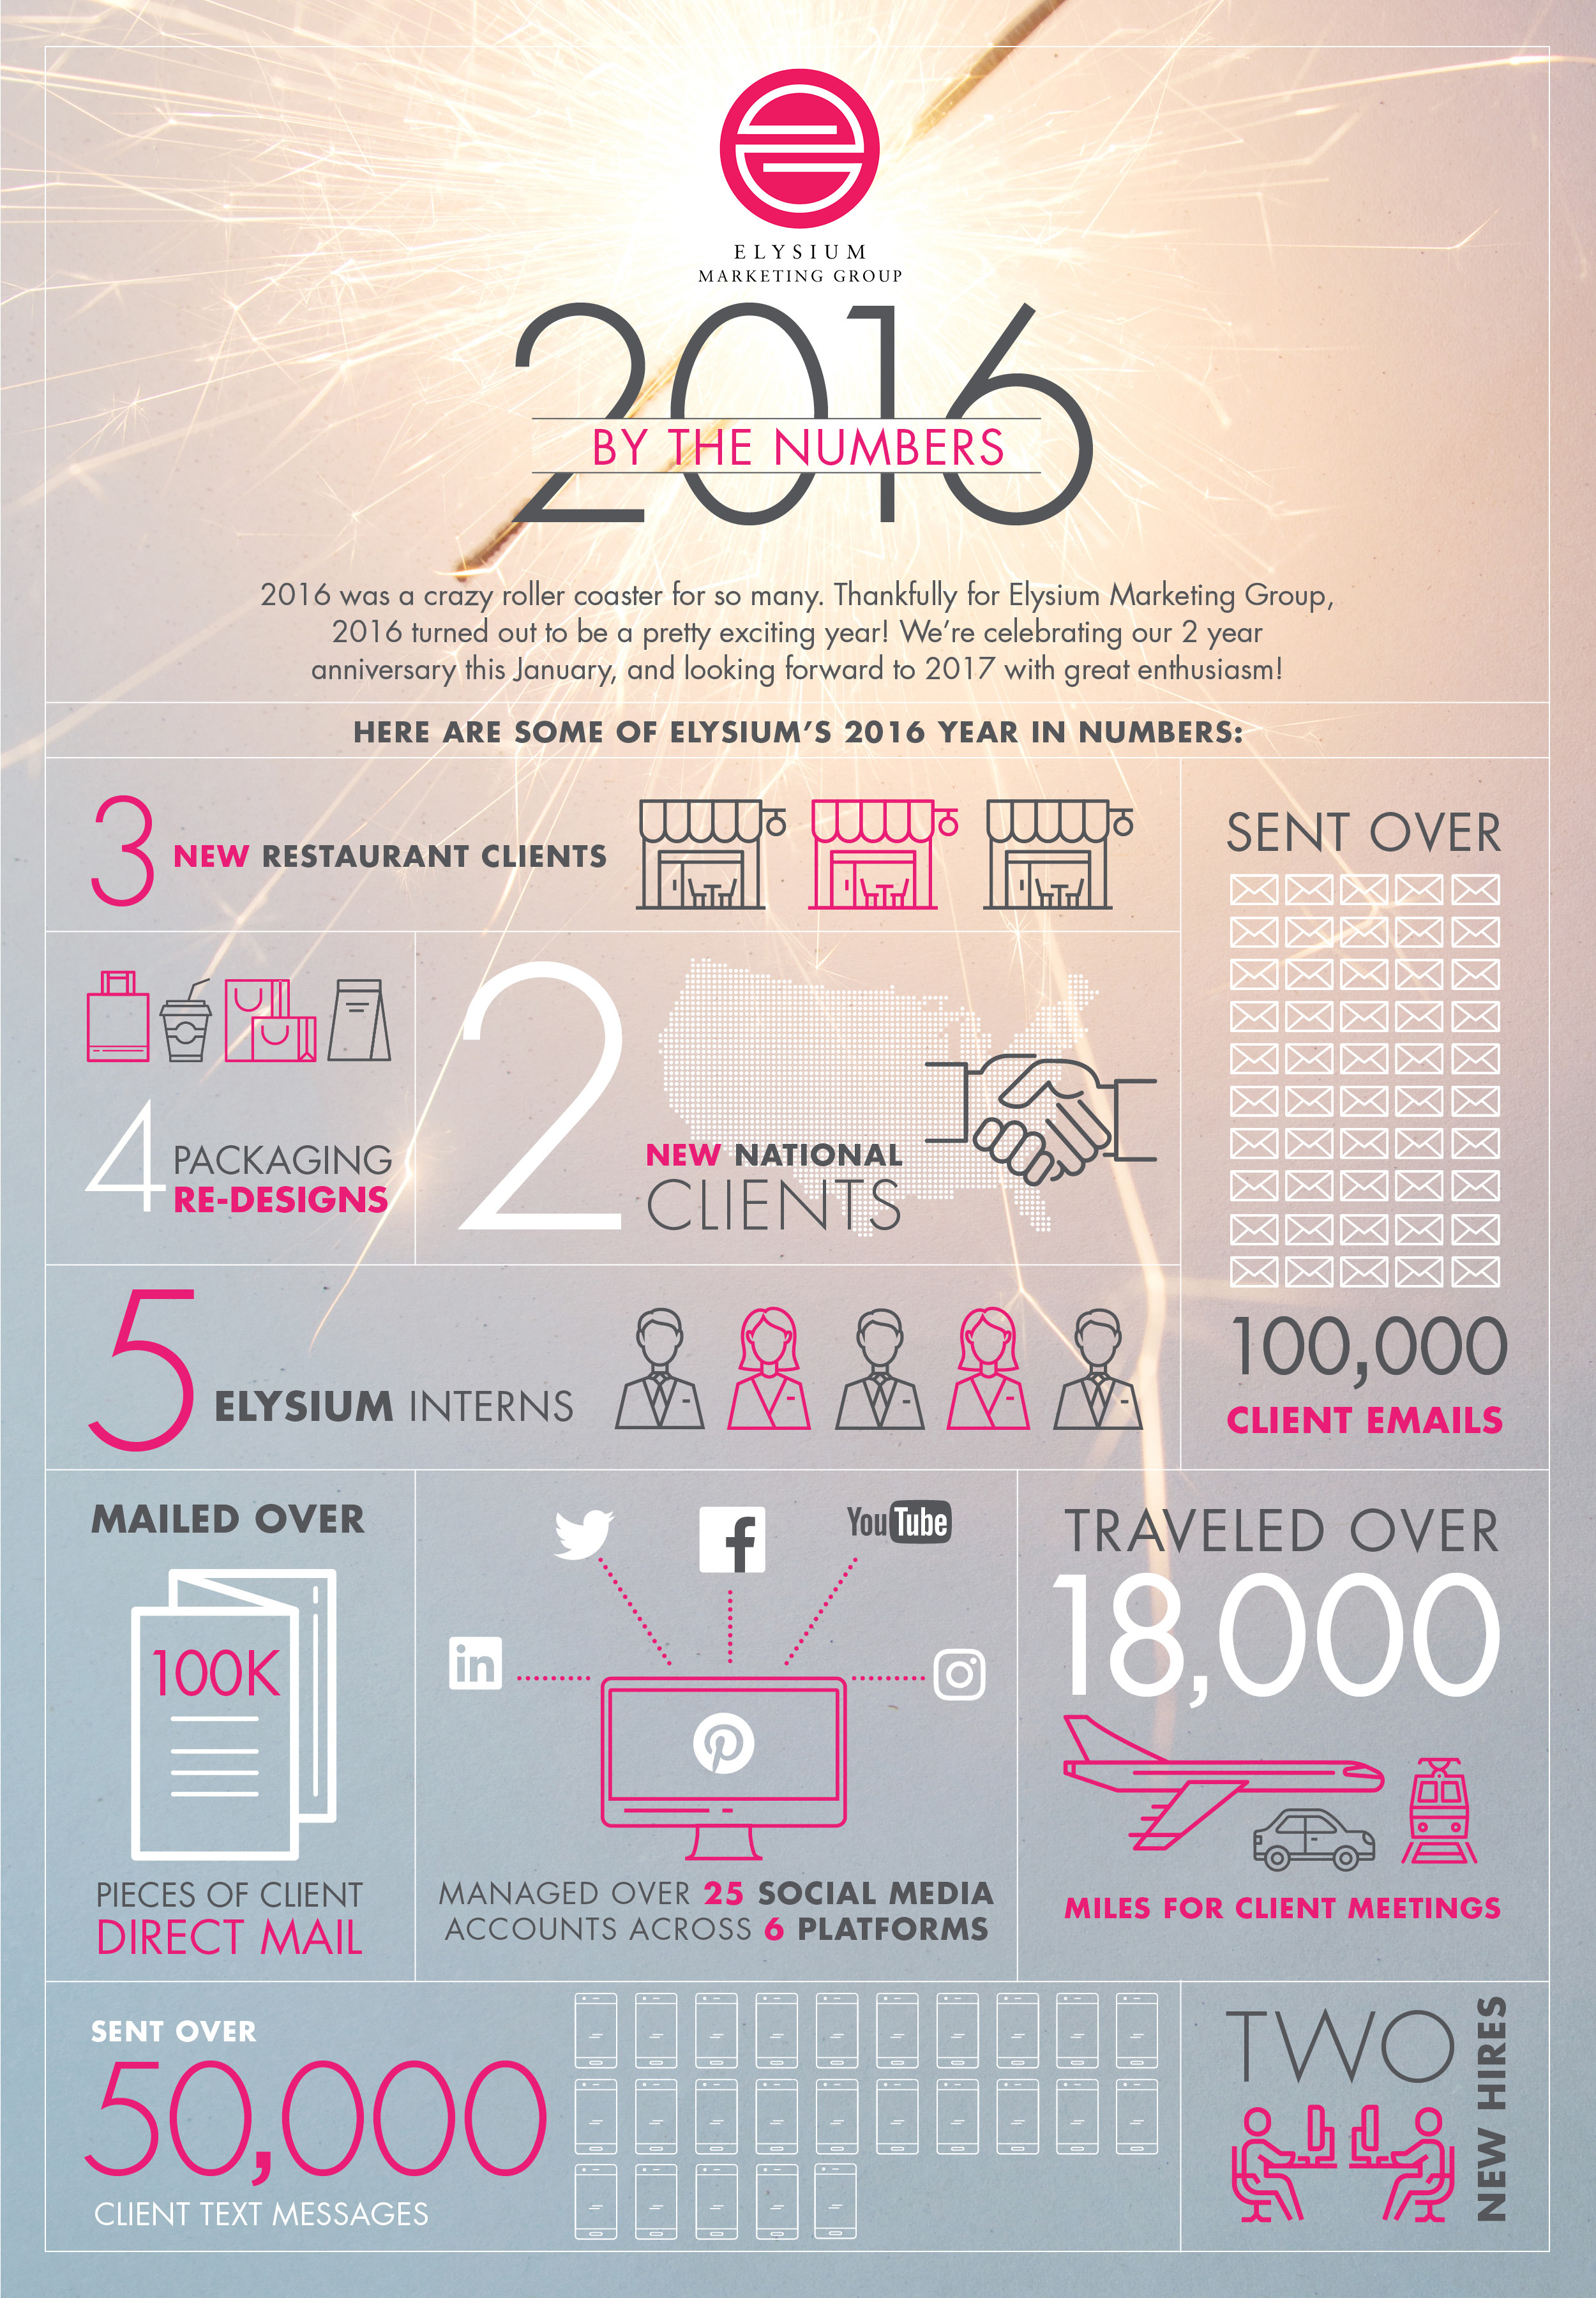 Elysium 2016 Infographic